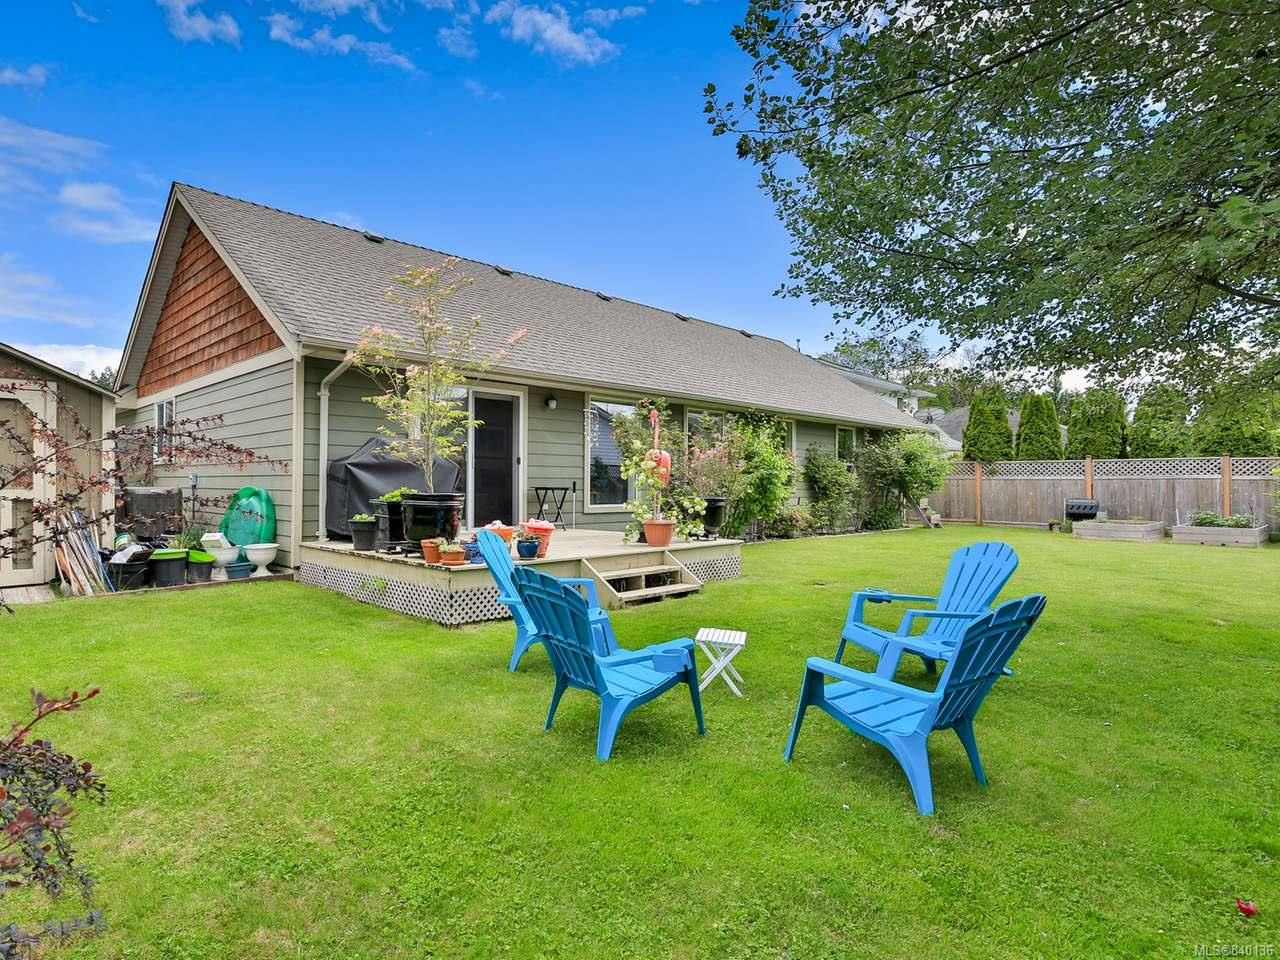 Photo 29: Photos: 5484 W Woodland Cres in PORT ALBERNI: PA Port Alberni House for sale (Port Alberni)  : MLS®# 840136